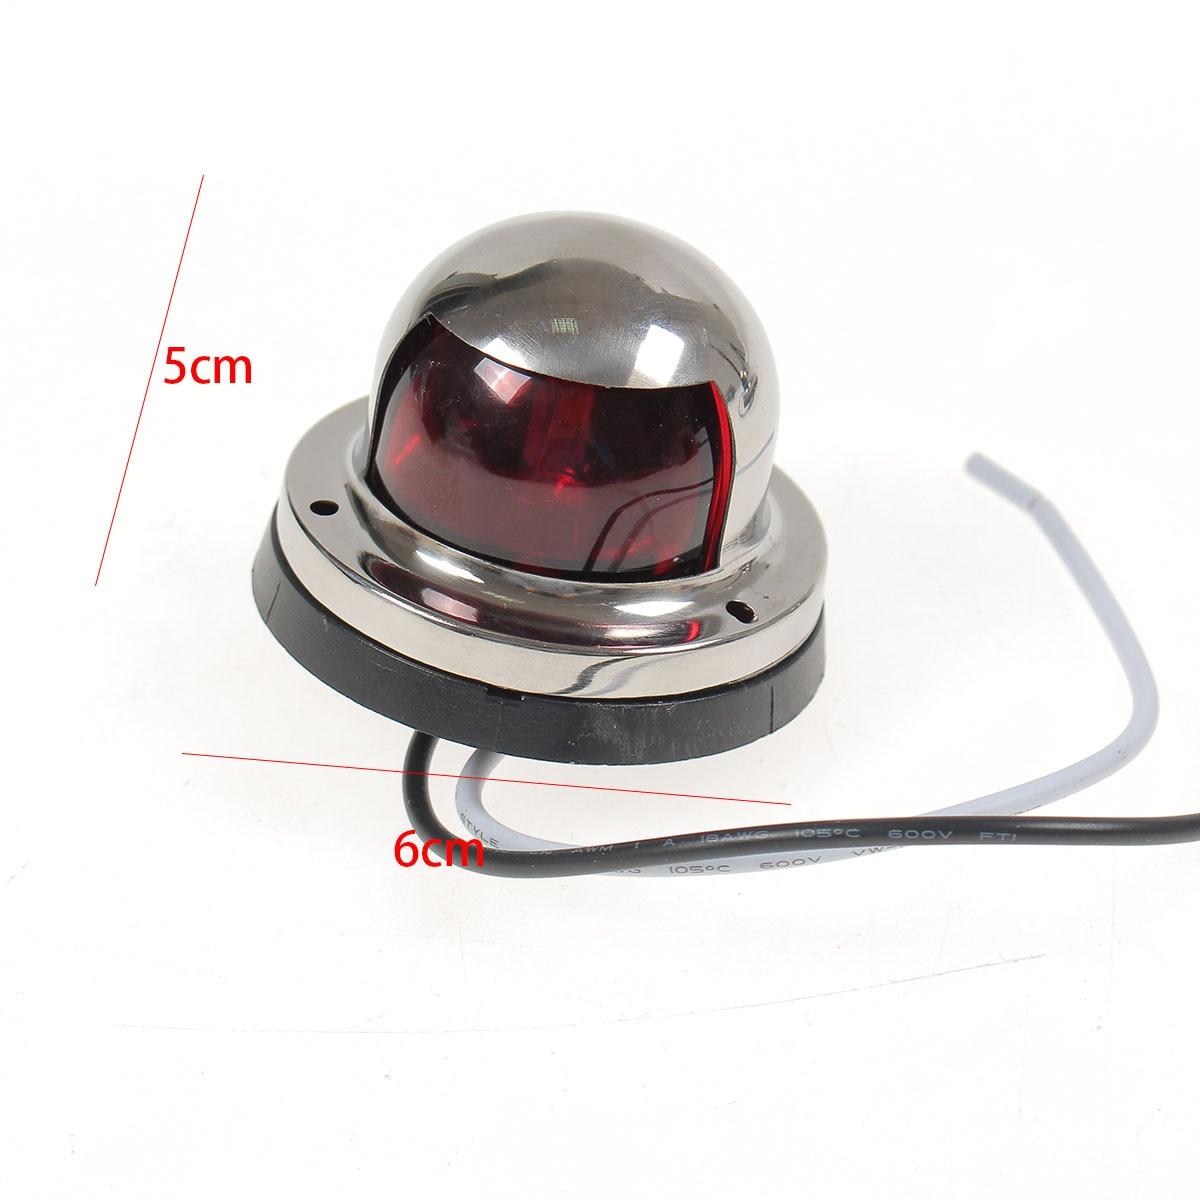 2x Red Green 6cm 12V Stainless Steel Marine Boat LED Yacht Bow Navigation Light